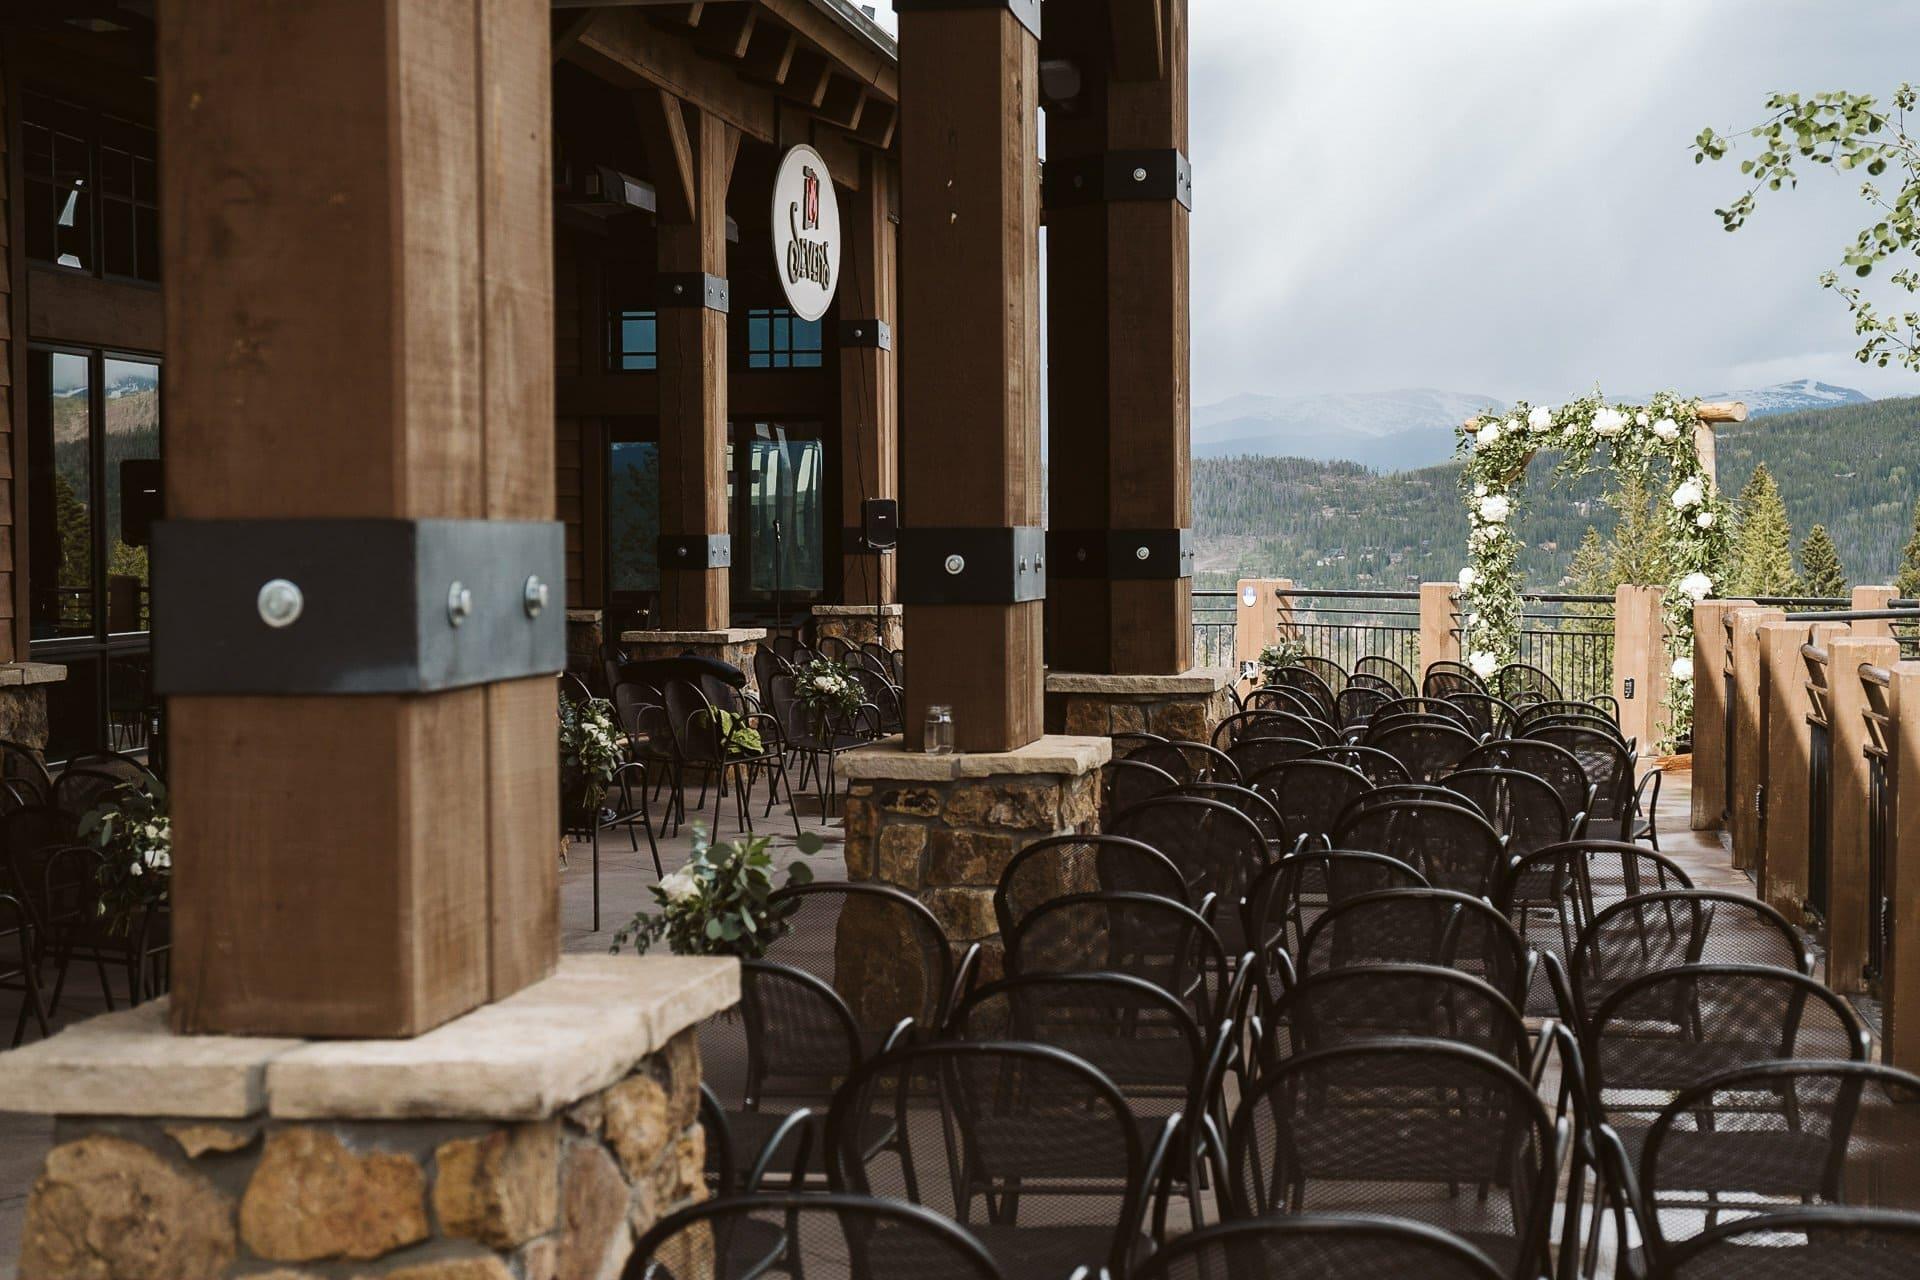 Wedding ceremony and reception at Sevens at Breckenridge Ski Resort, Colorado mountain wedding photographer